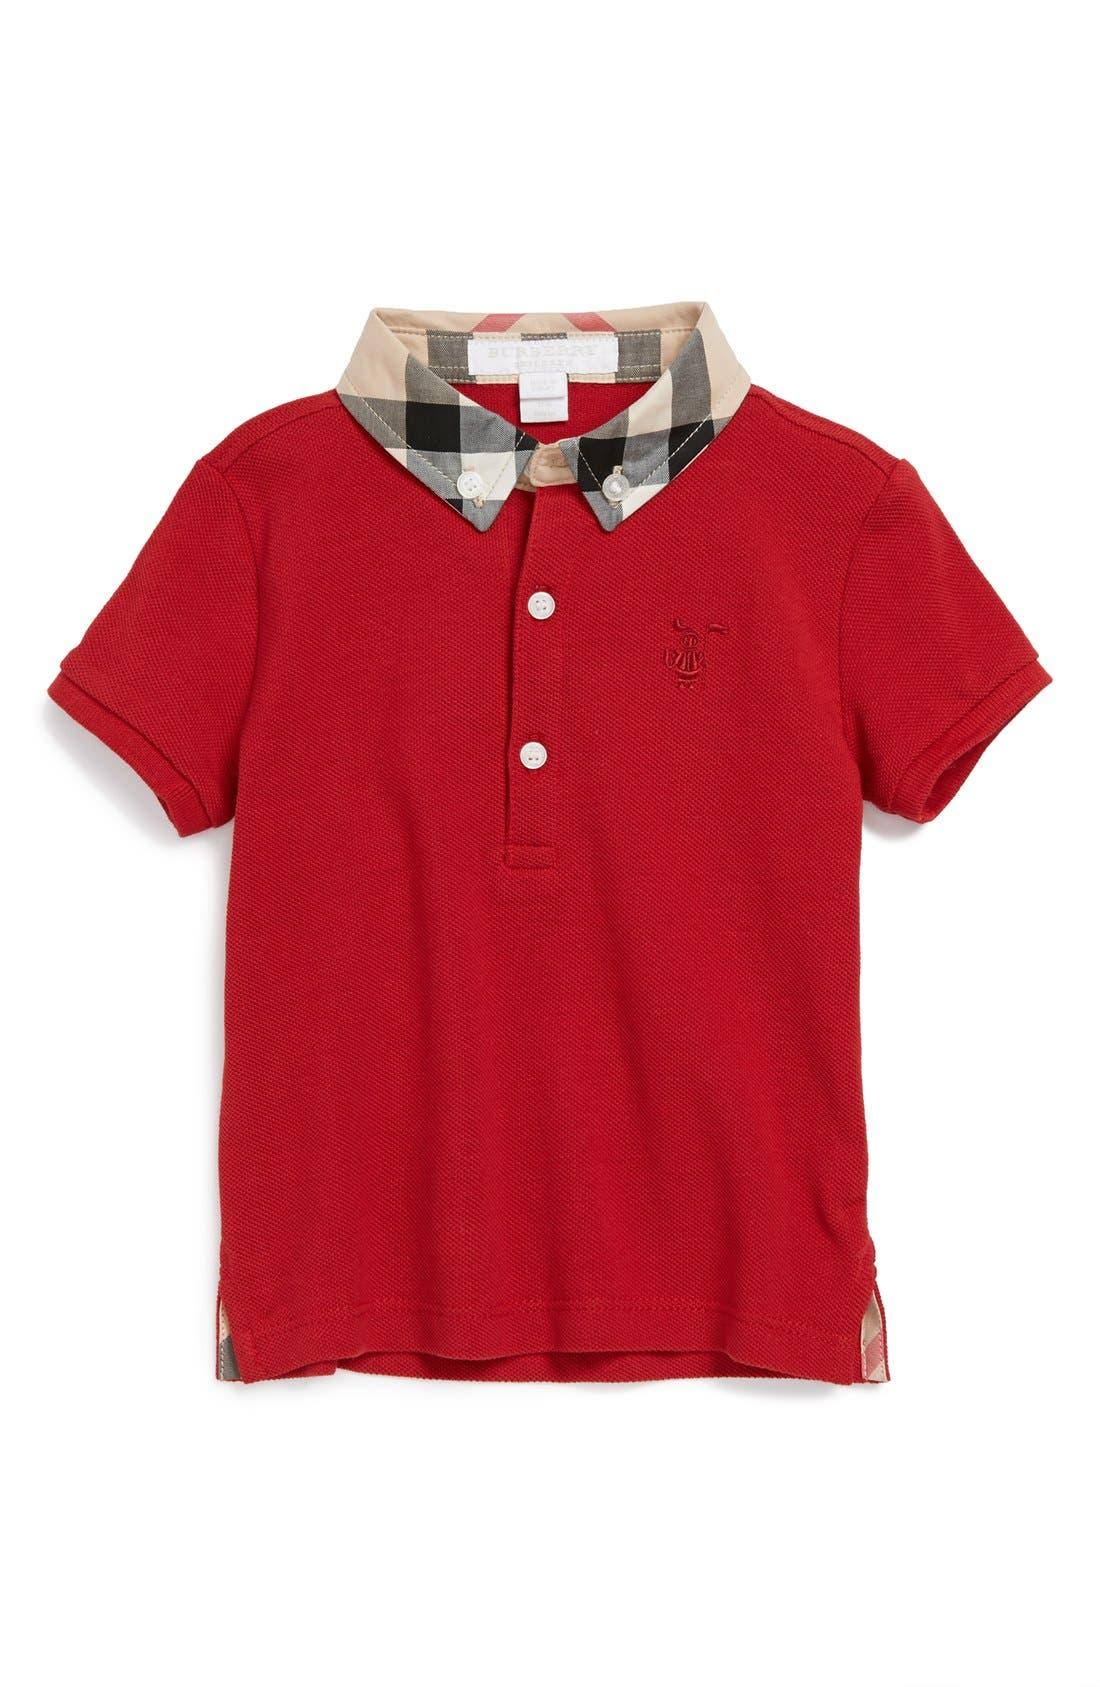 Main Image - Burberry 'William' Cotton Polo (Baby Boys)